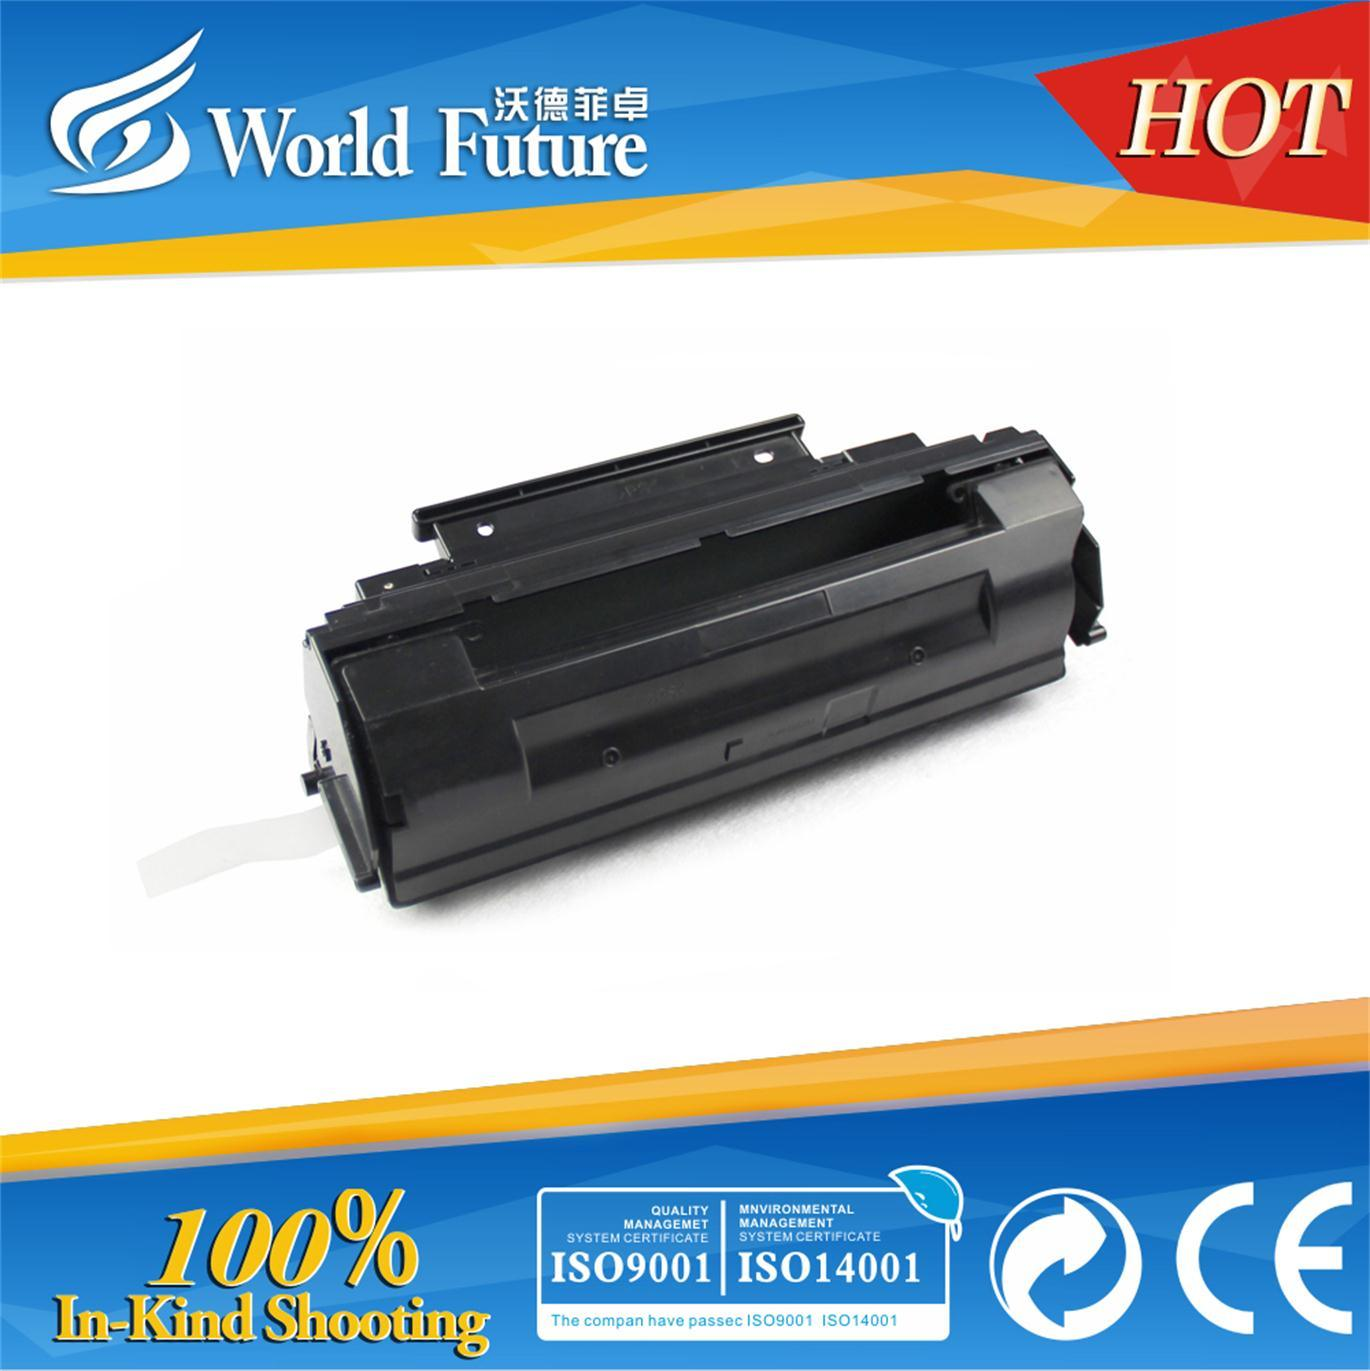 Premium One-Body High Laser Printer Toner Cartridge for Panasonic (UG-3380) (Drum)